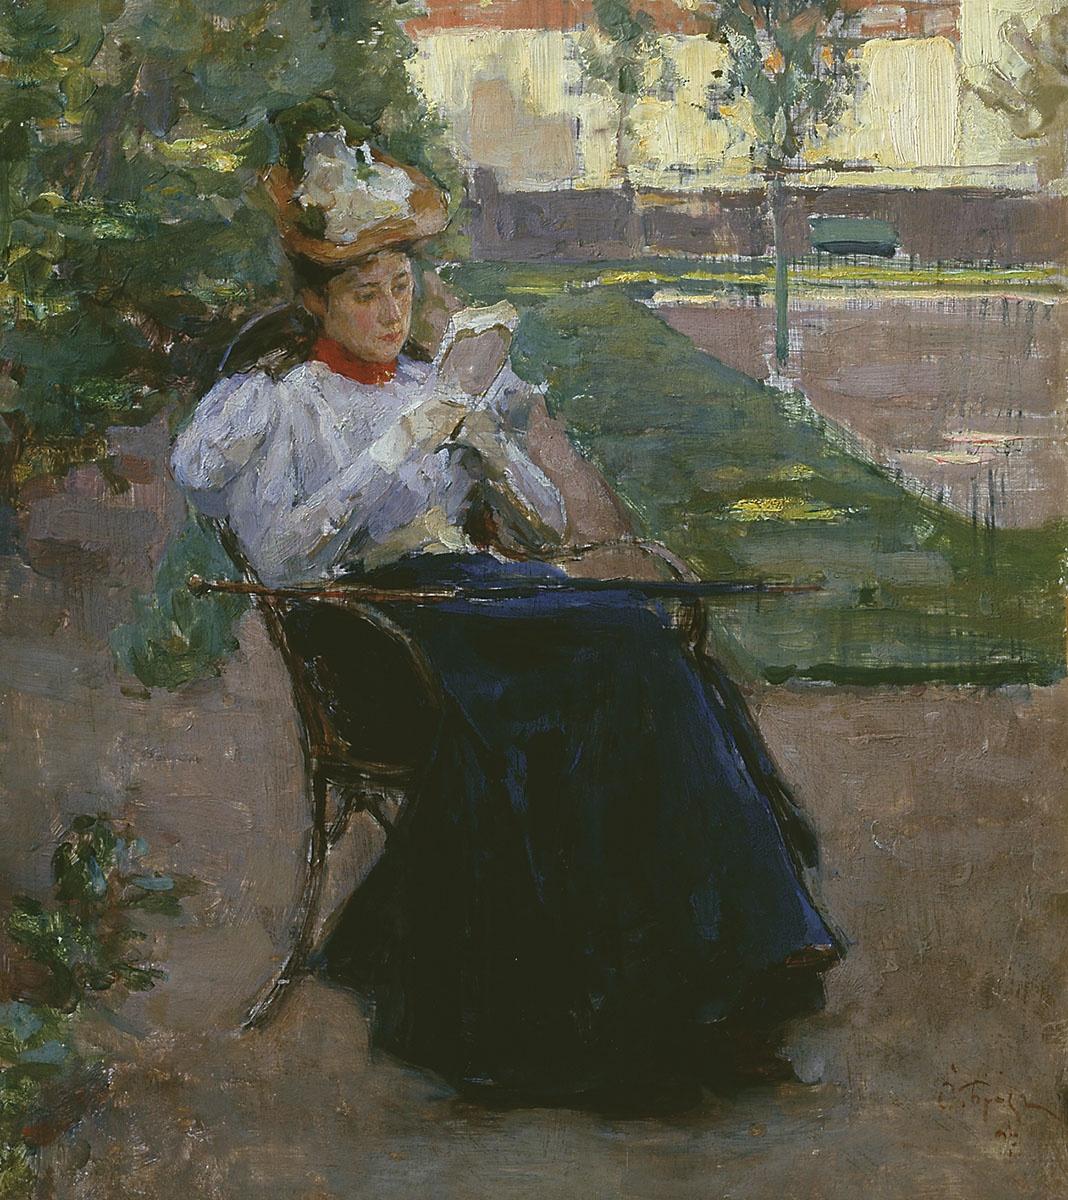 Osip Emmanuilovich (Joseph) Braz. For reading. 1897